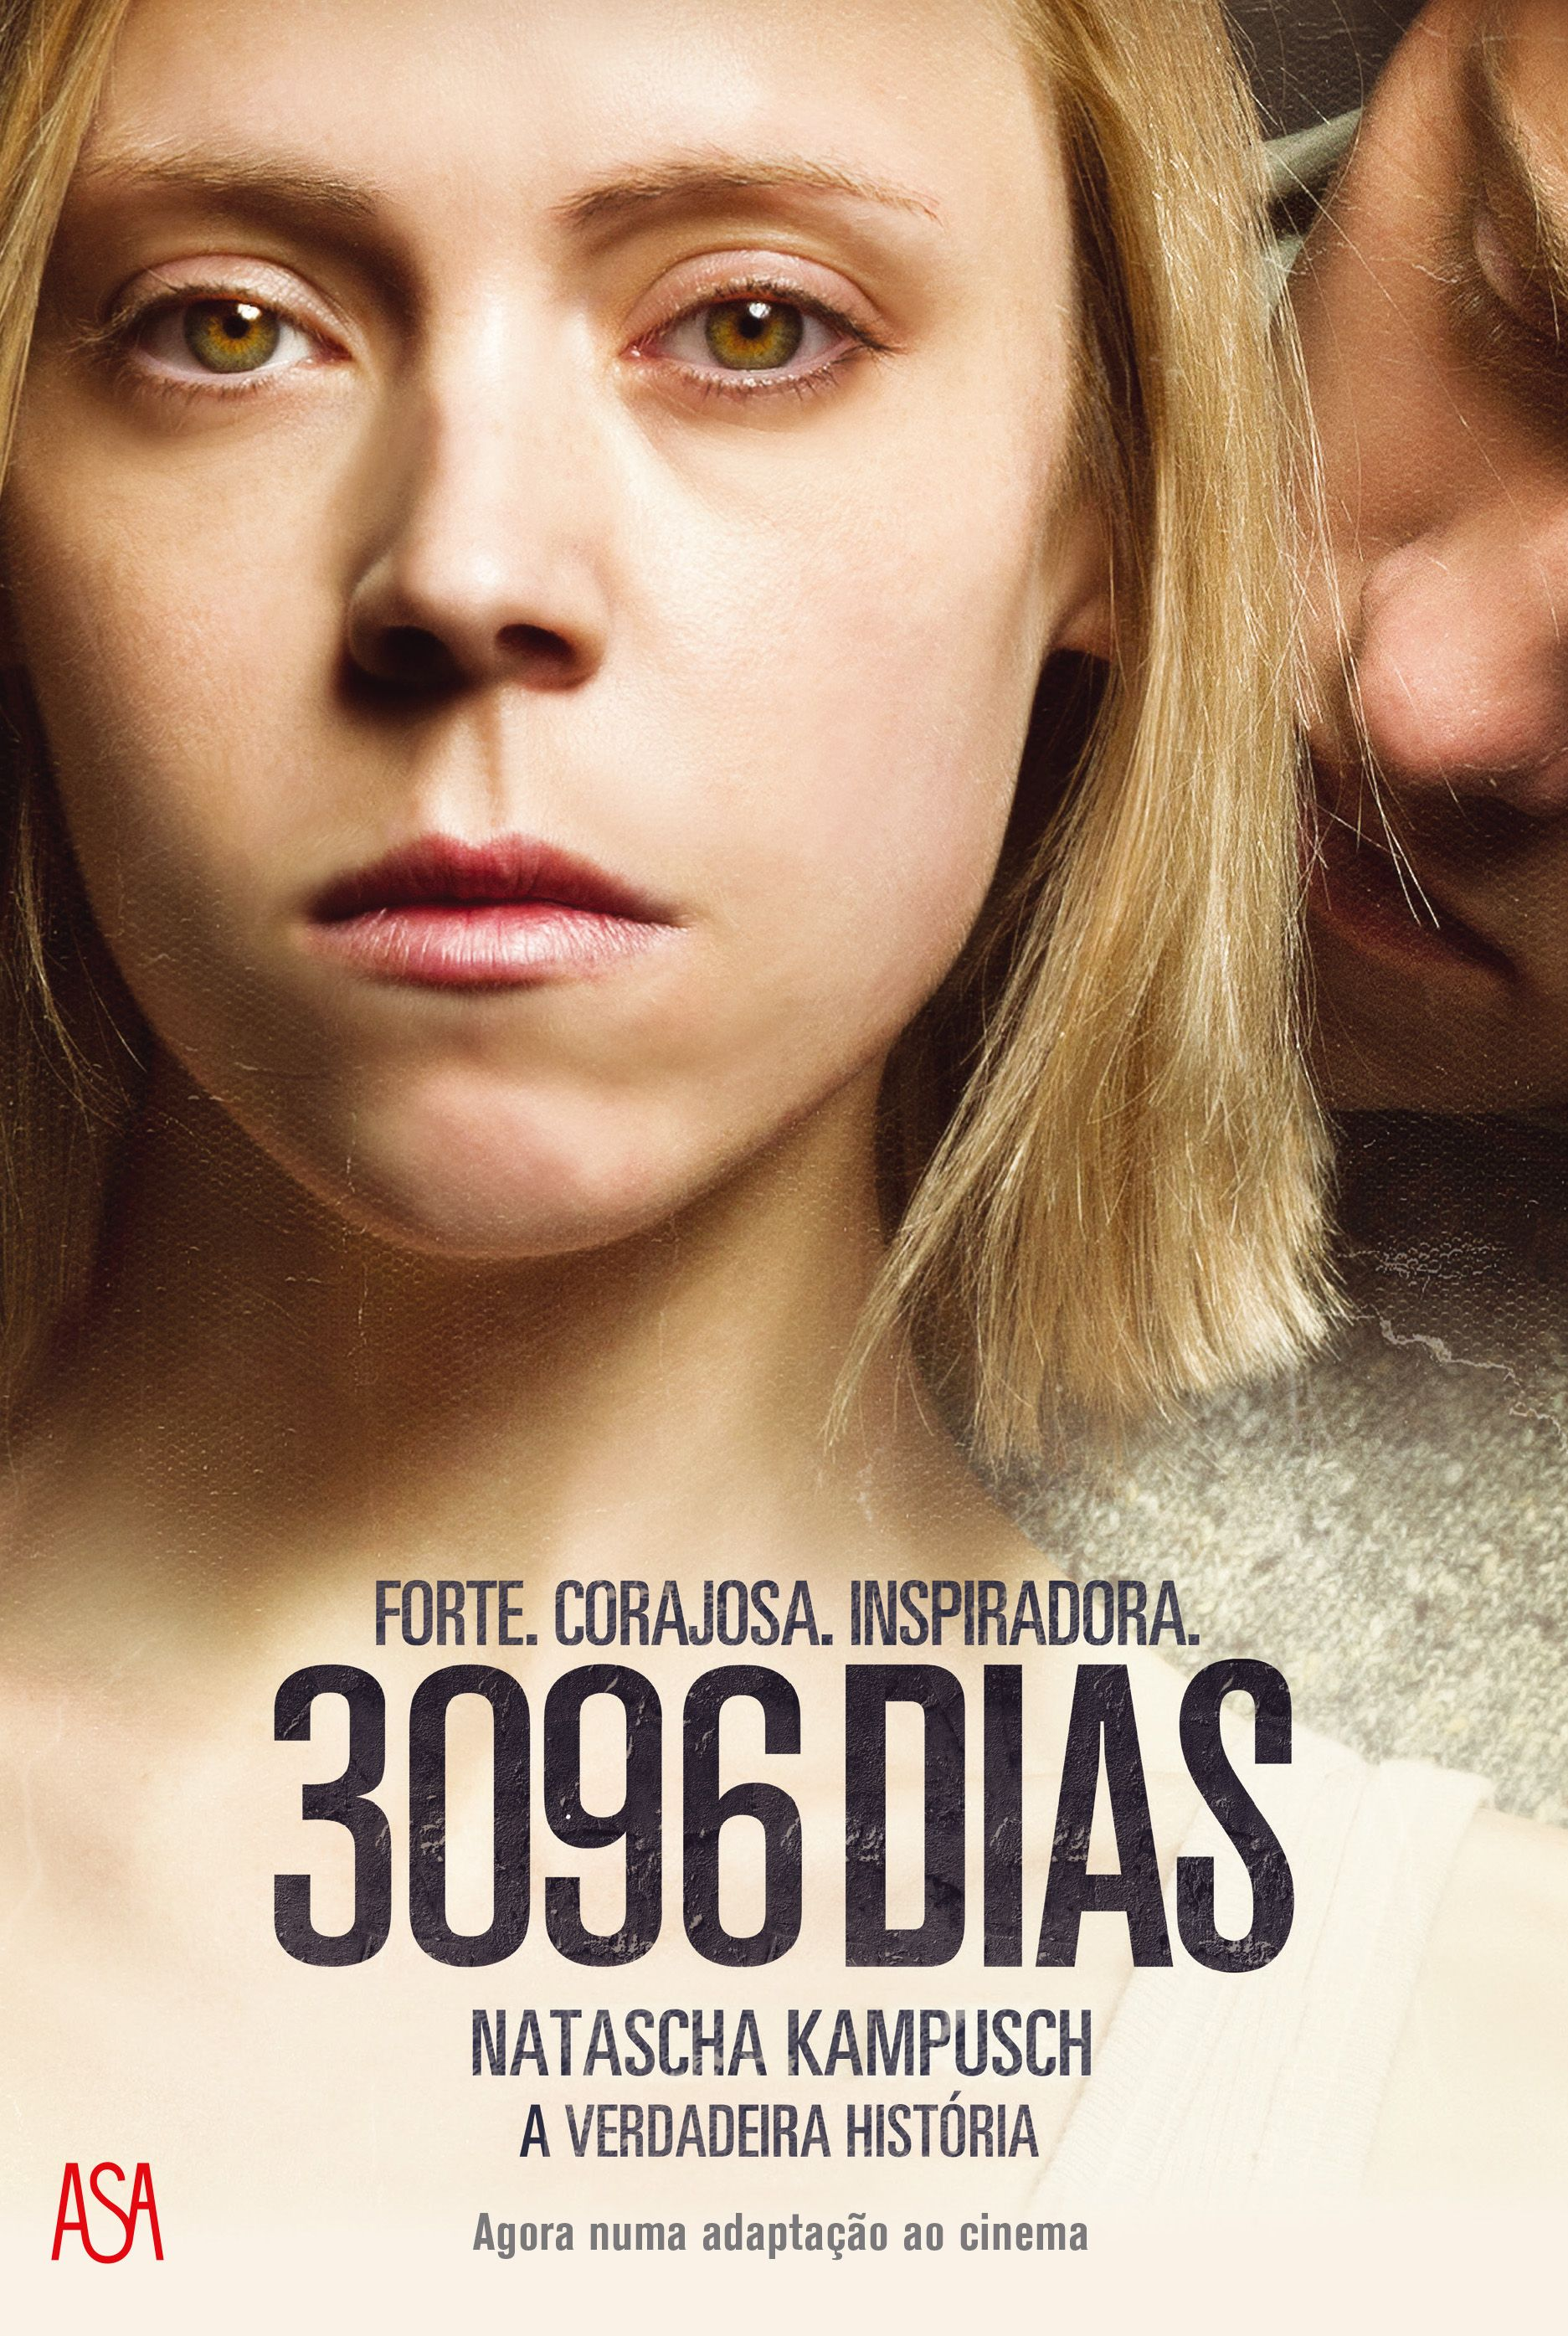 3096 Dias Peliculas Online Gratis Peliculas Online Peliculas De Drama